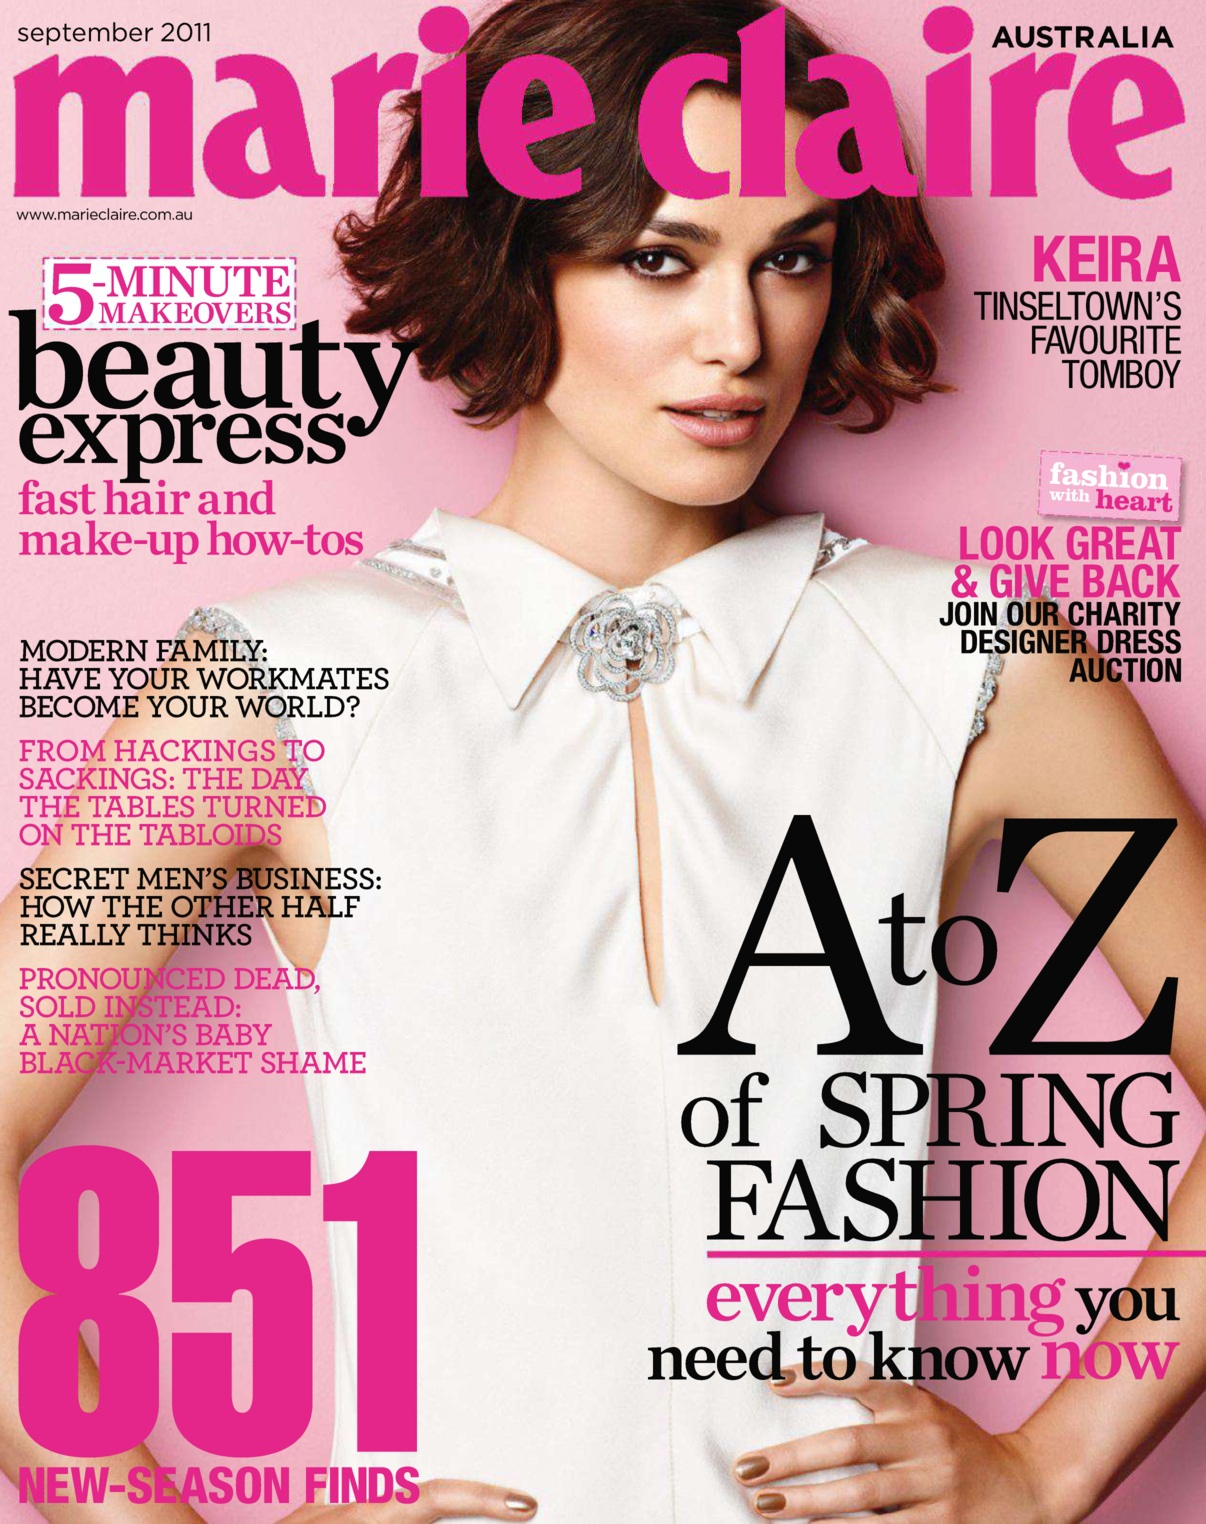 http://2.bp.blogspot.com/-IqnG0hJvUD8/Tj-_6MMsWVI/AAAAAAAAC1c/3OPb_SWXlIU/s1600/by_mah0ne-Keira_Knightley_Marie_Claire_Magazine_Australia_September_2011_001.jpg